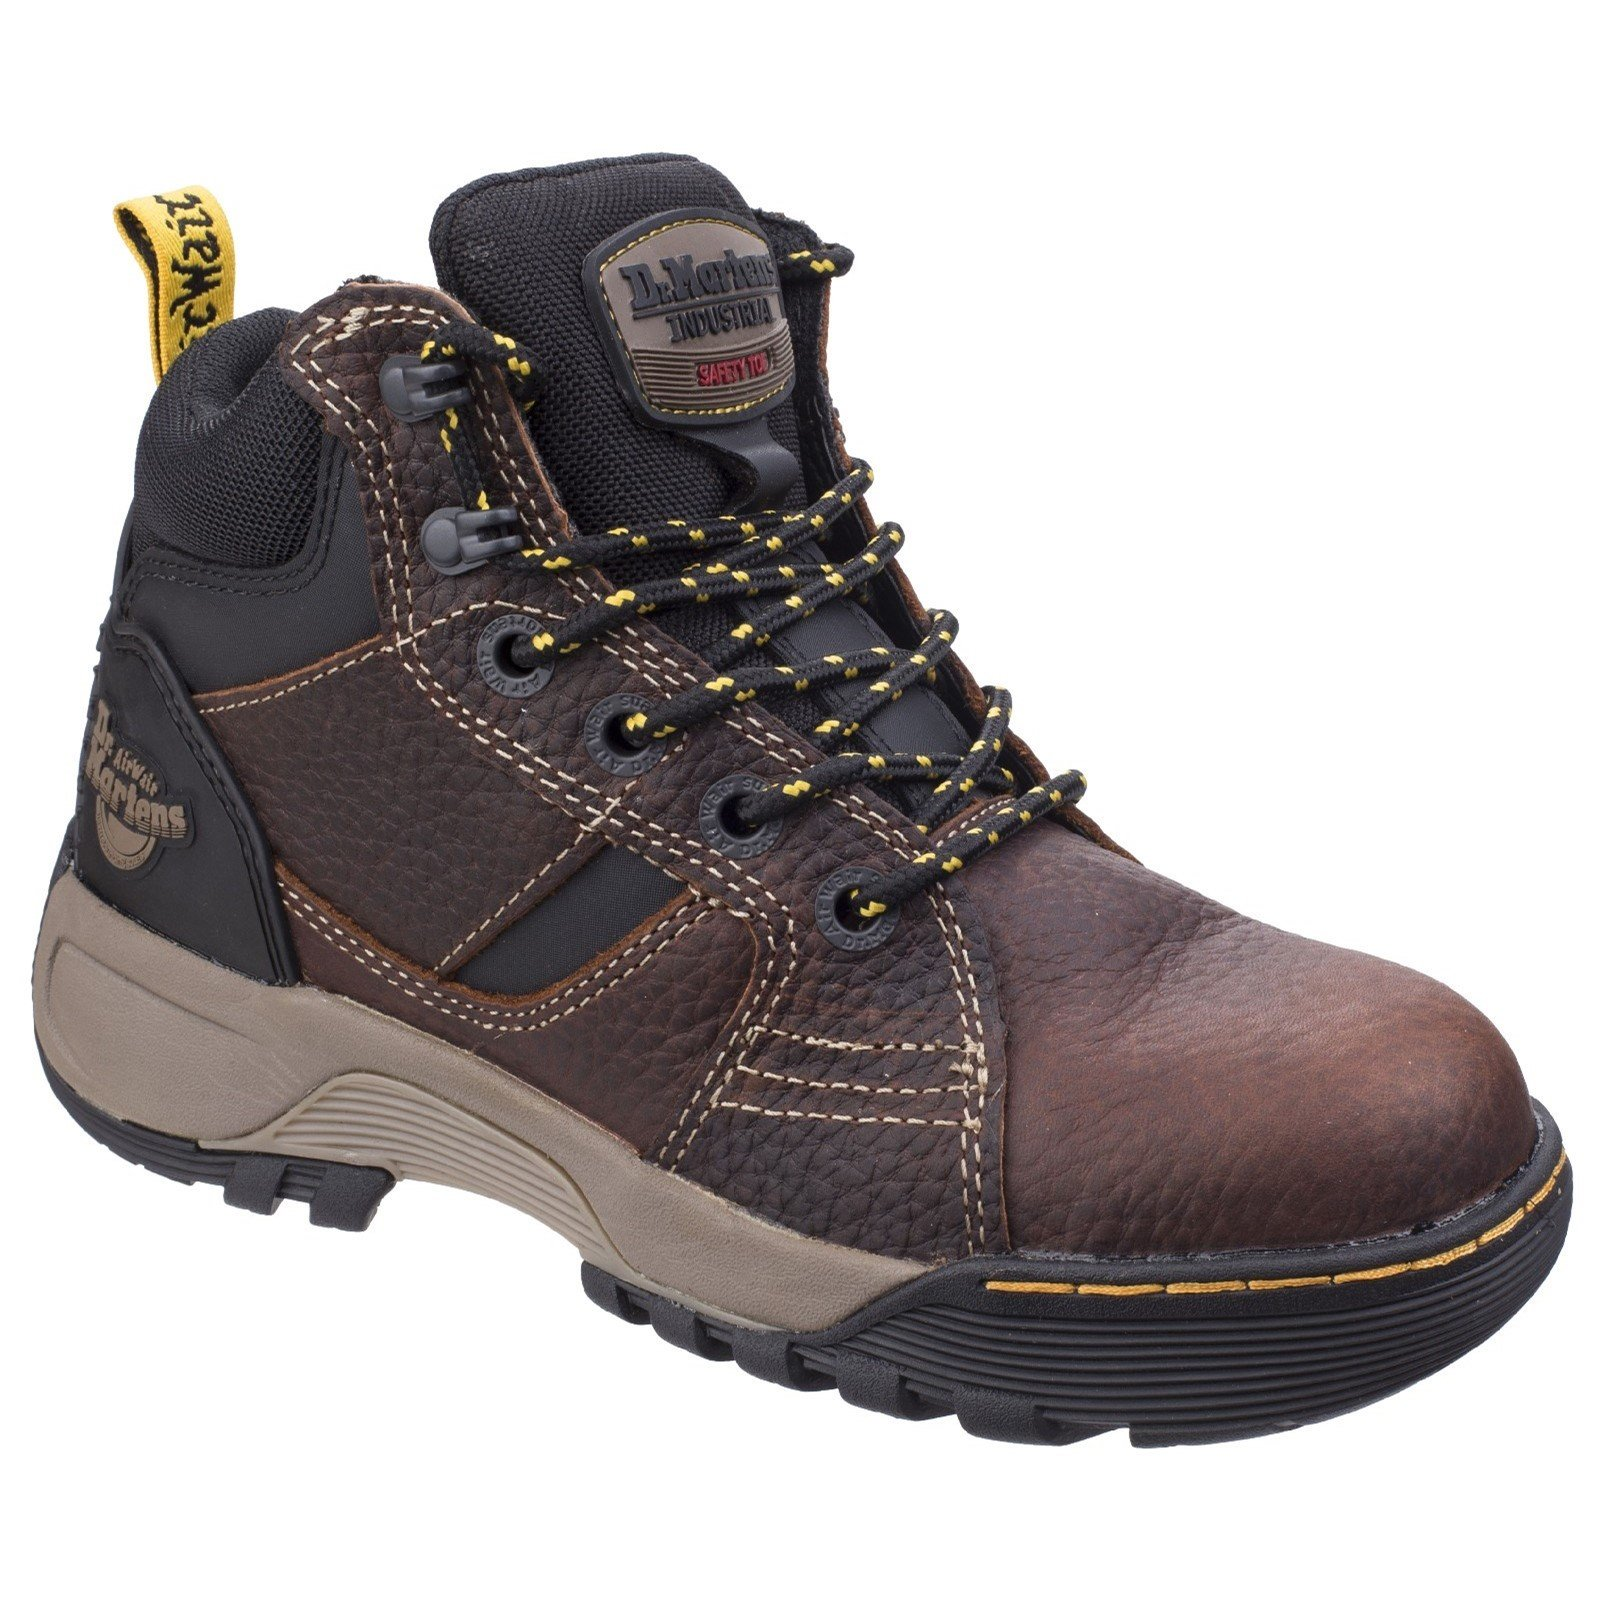 Dr Martens Men's Grapple Safety Boot Various Colours 26023 - Teak 4